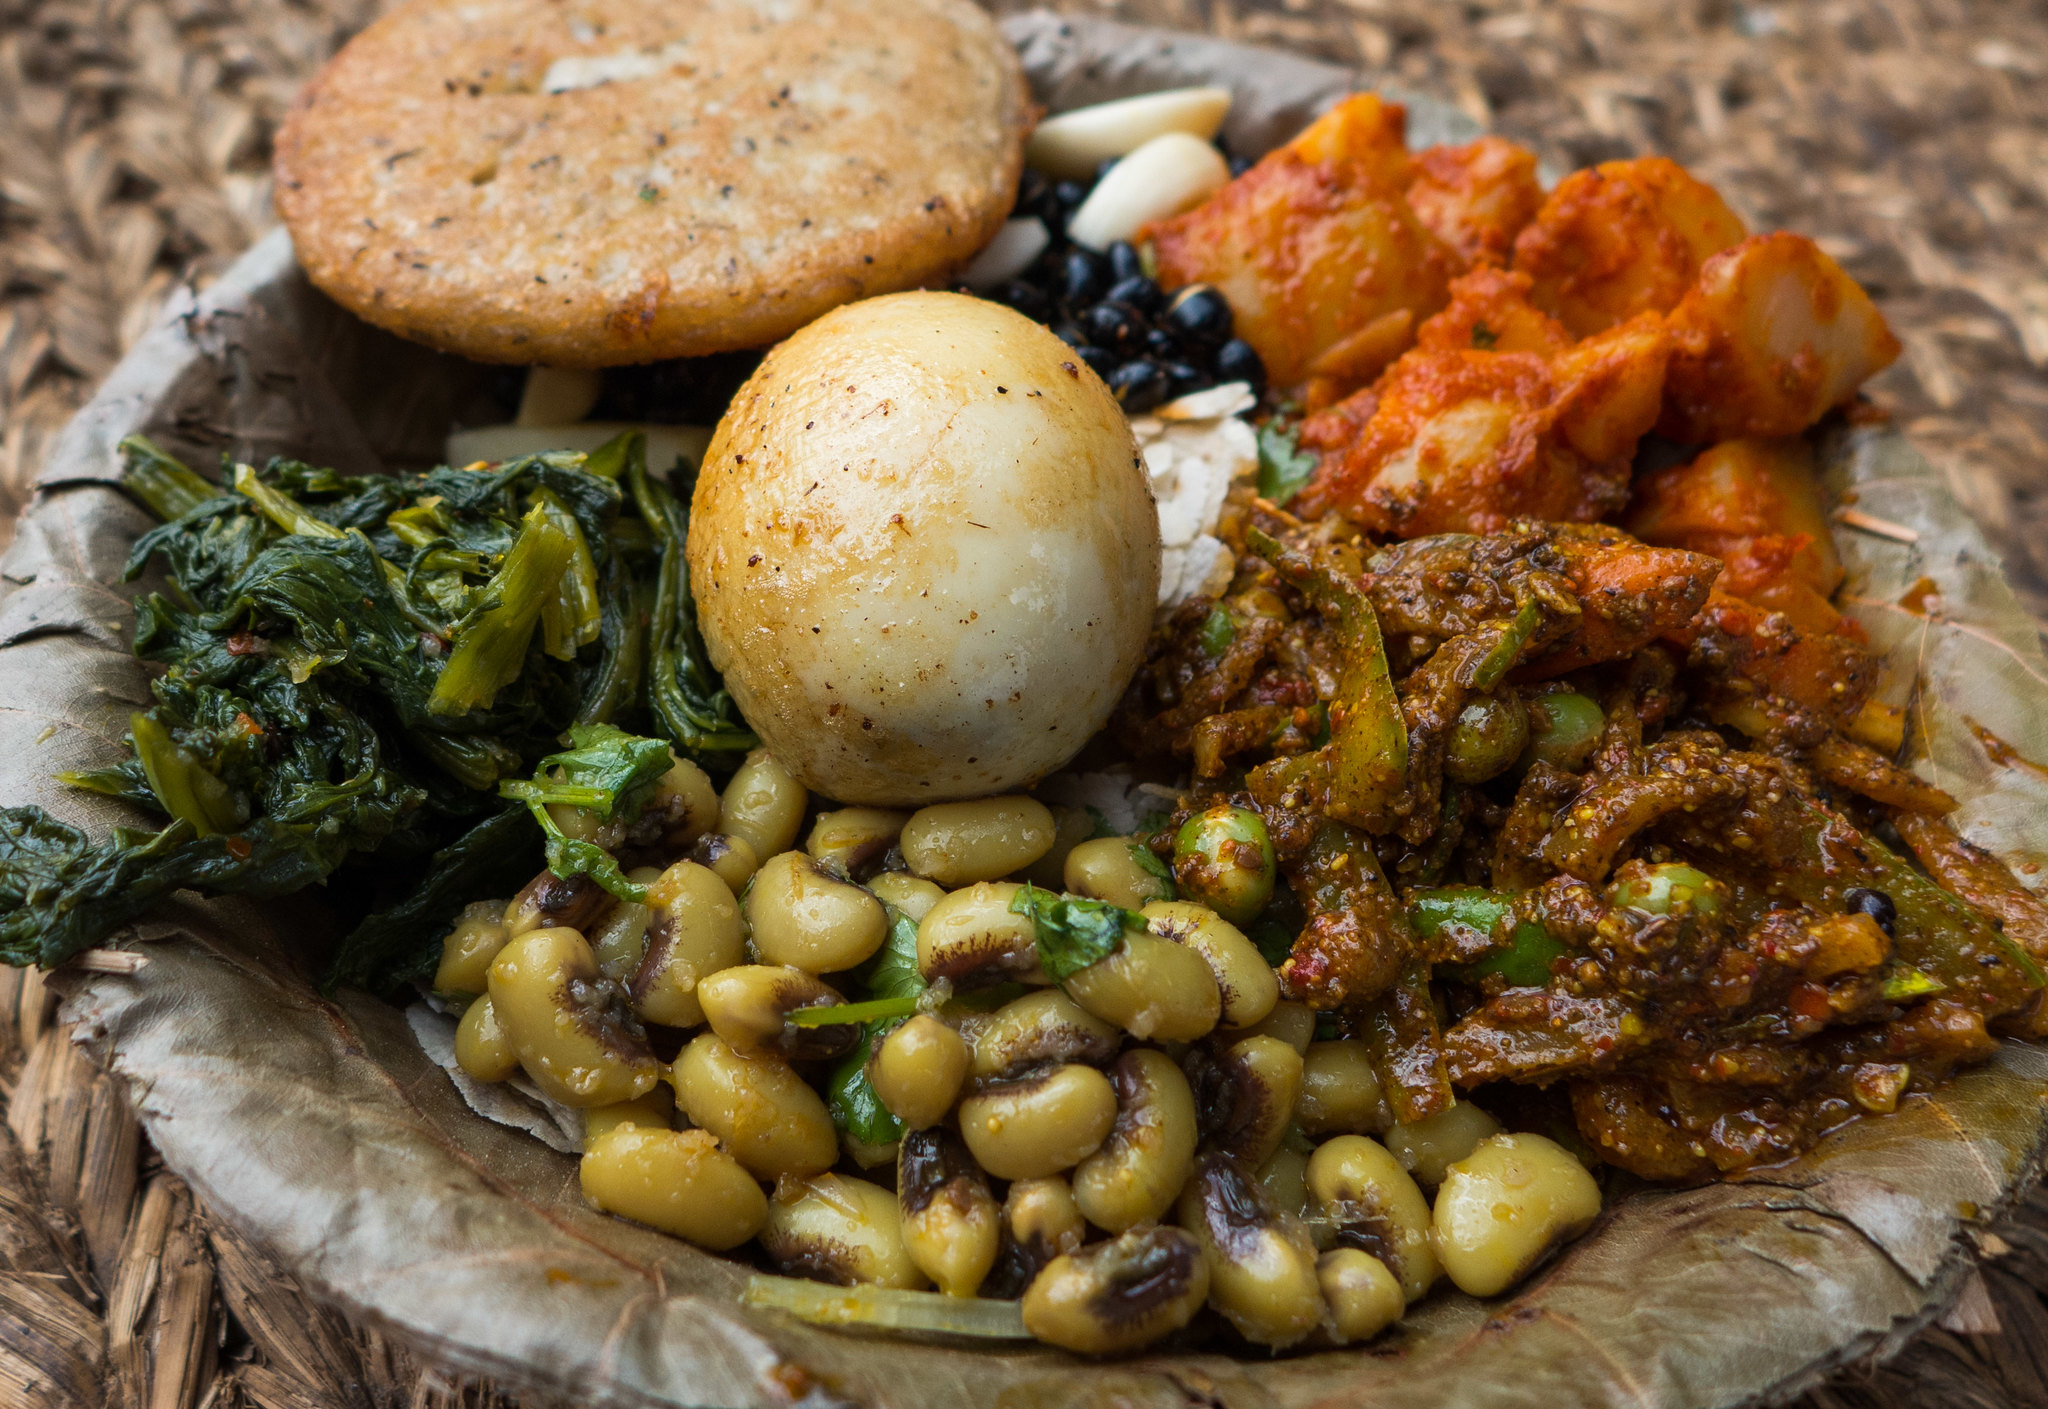 A traditional Newari meal. Photo: Sharada Prasad CS/Flickr